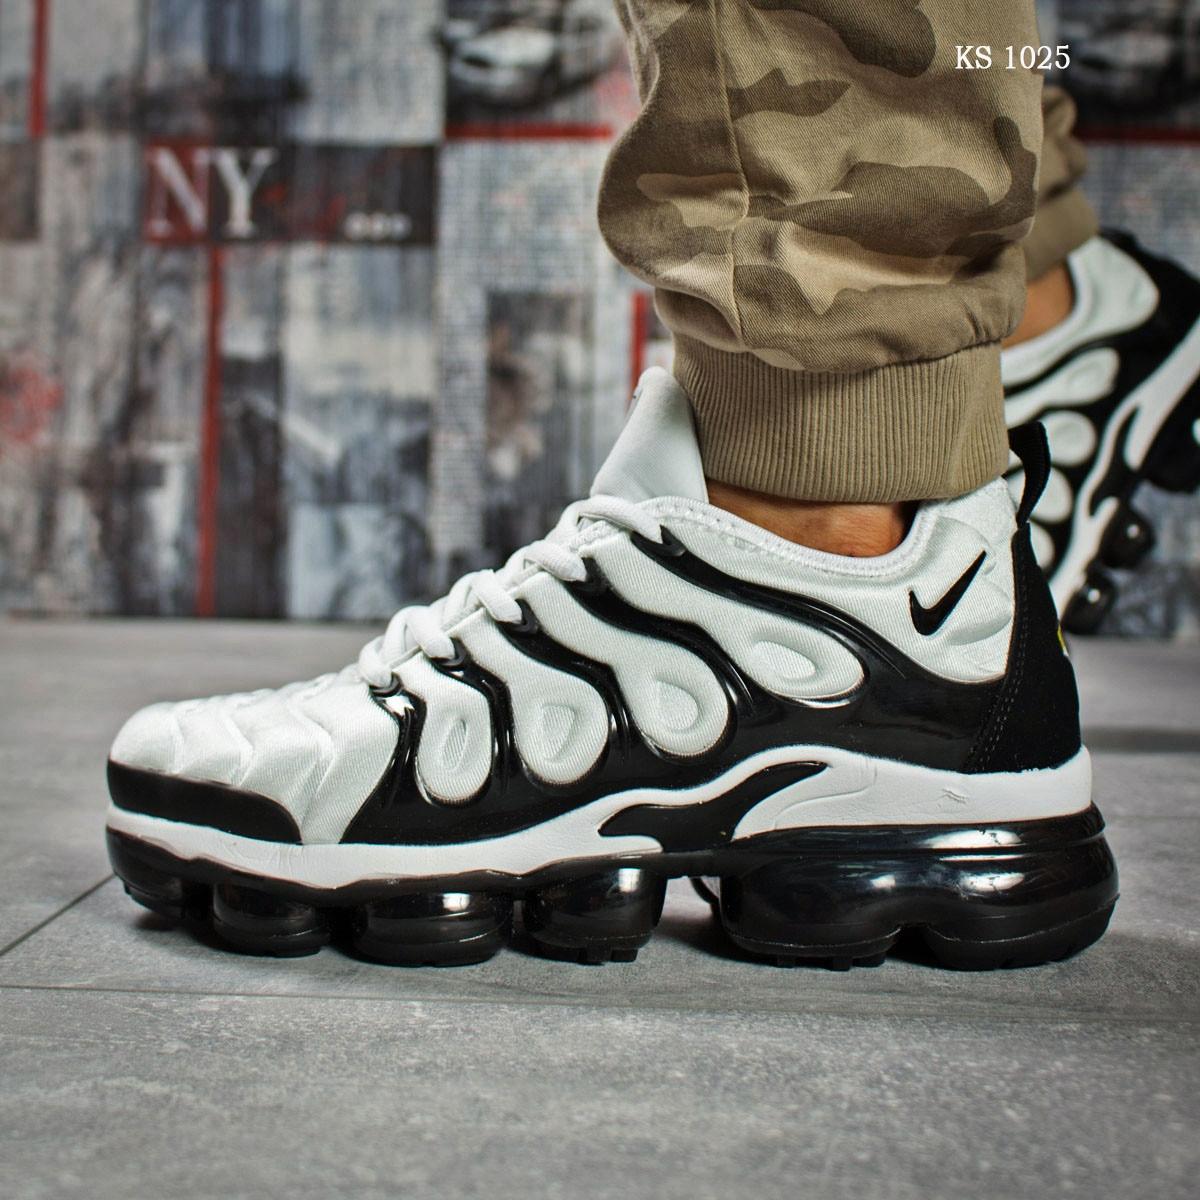 3b8f5608 Мужские кроссовки Nike TN Air, текстиль, белые с черным -  Vstrechayut_po_obuvke в Харькове